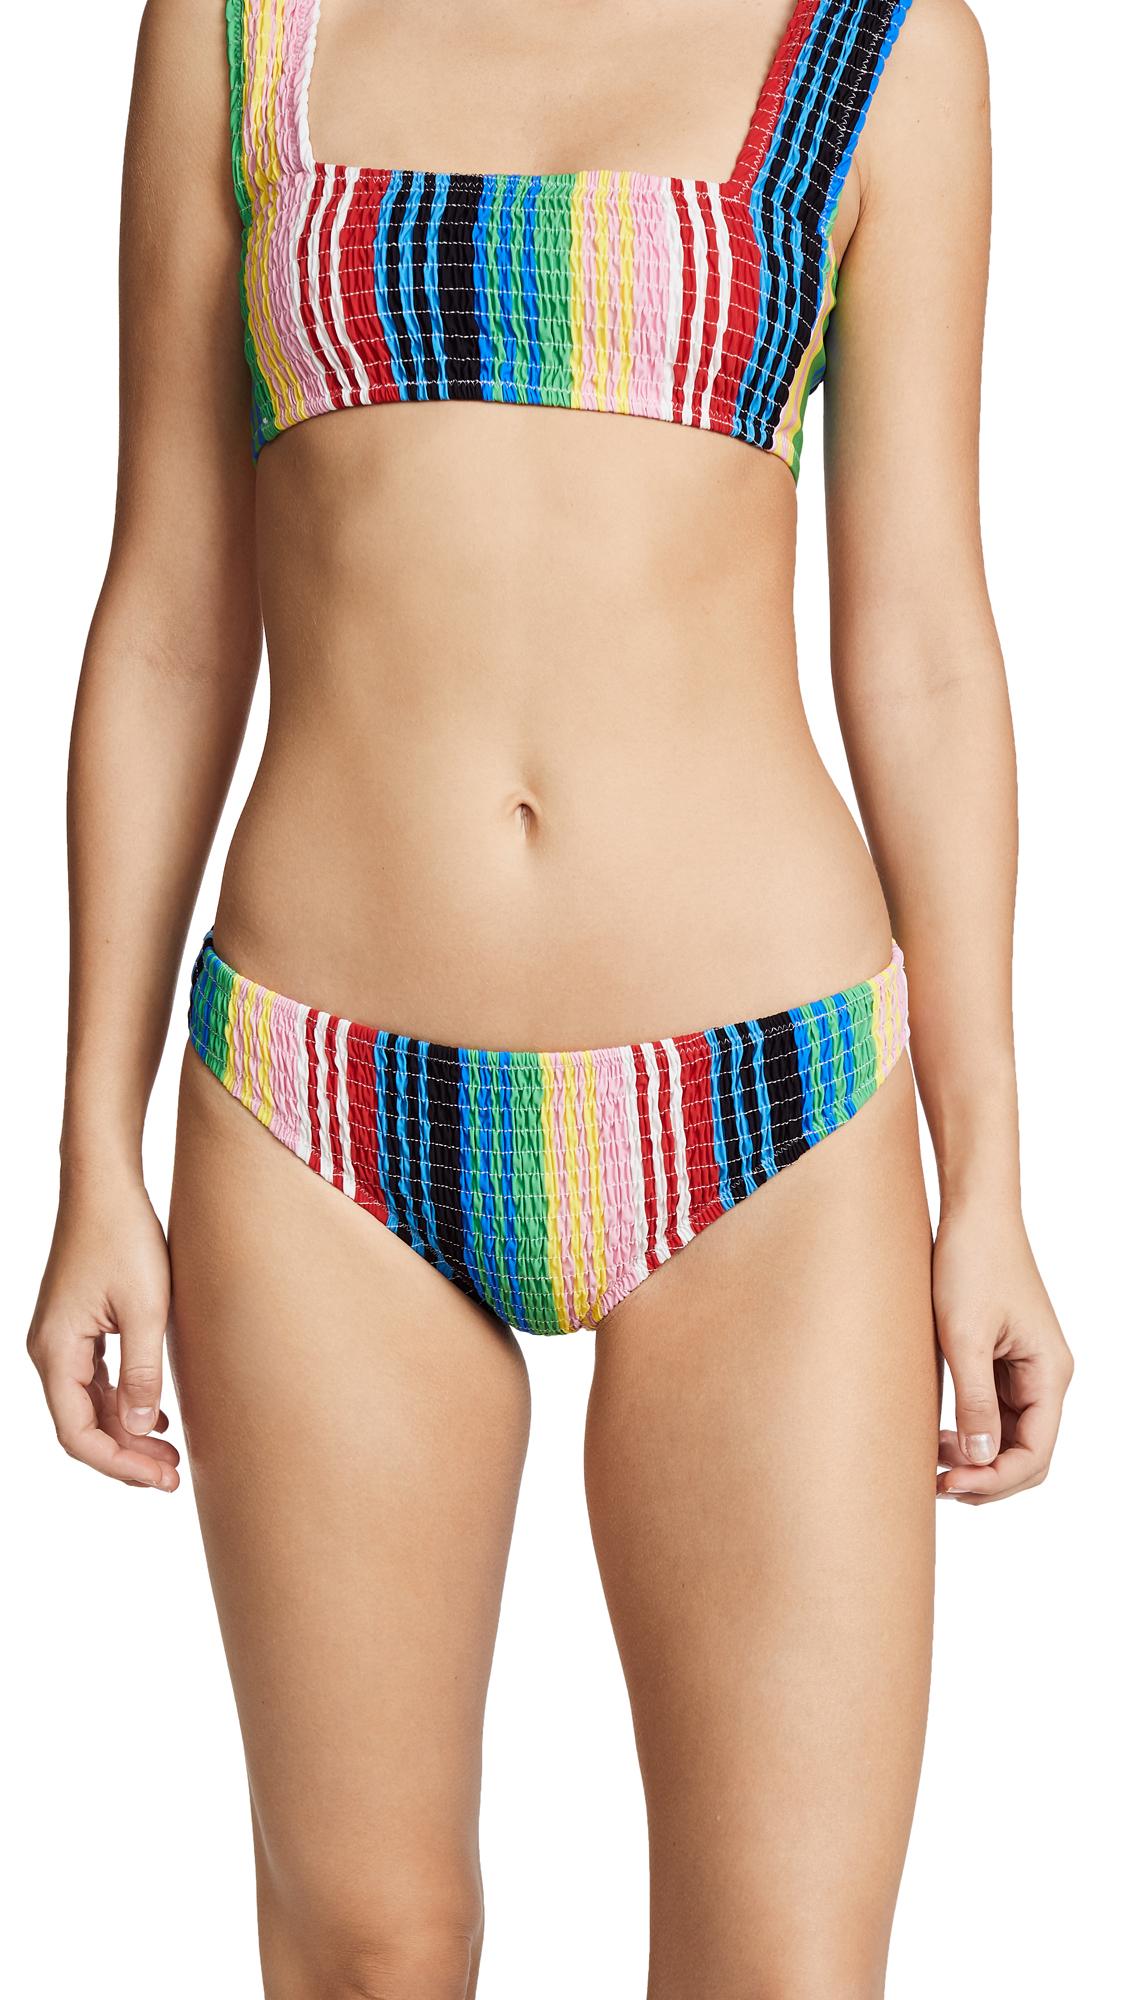 Diane von Furstenberg Smocked Cheeky Bikini Bottoms In Barnett Stripe Ivory Multi